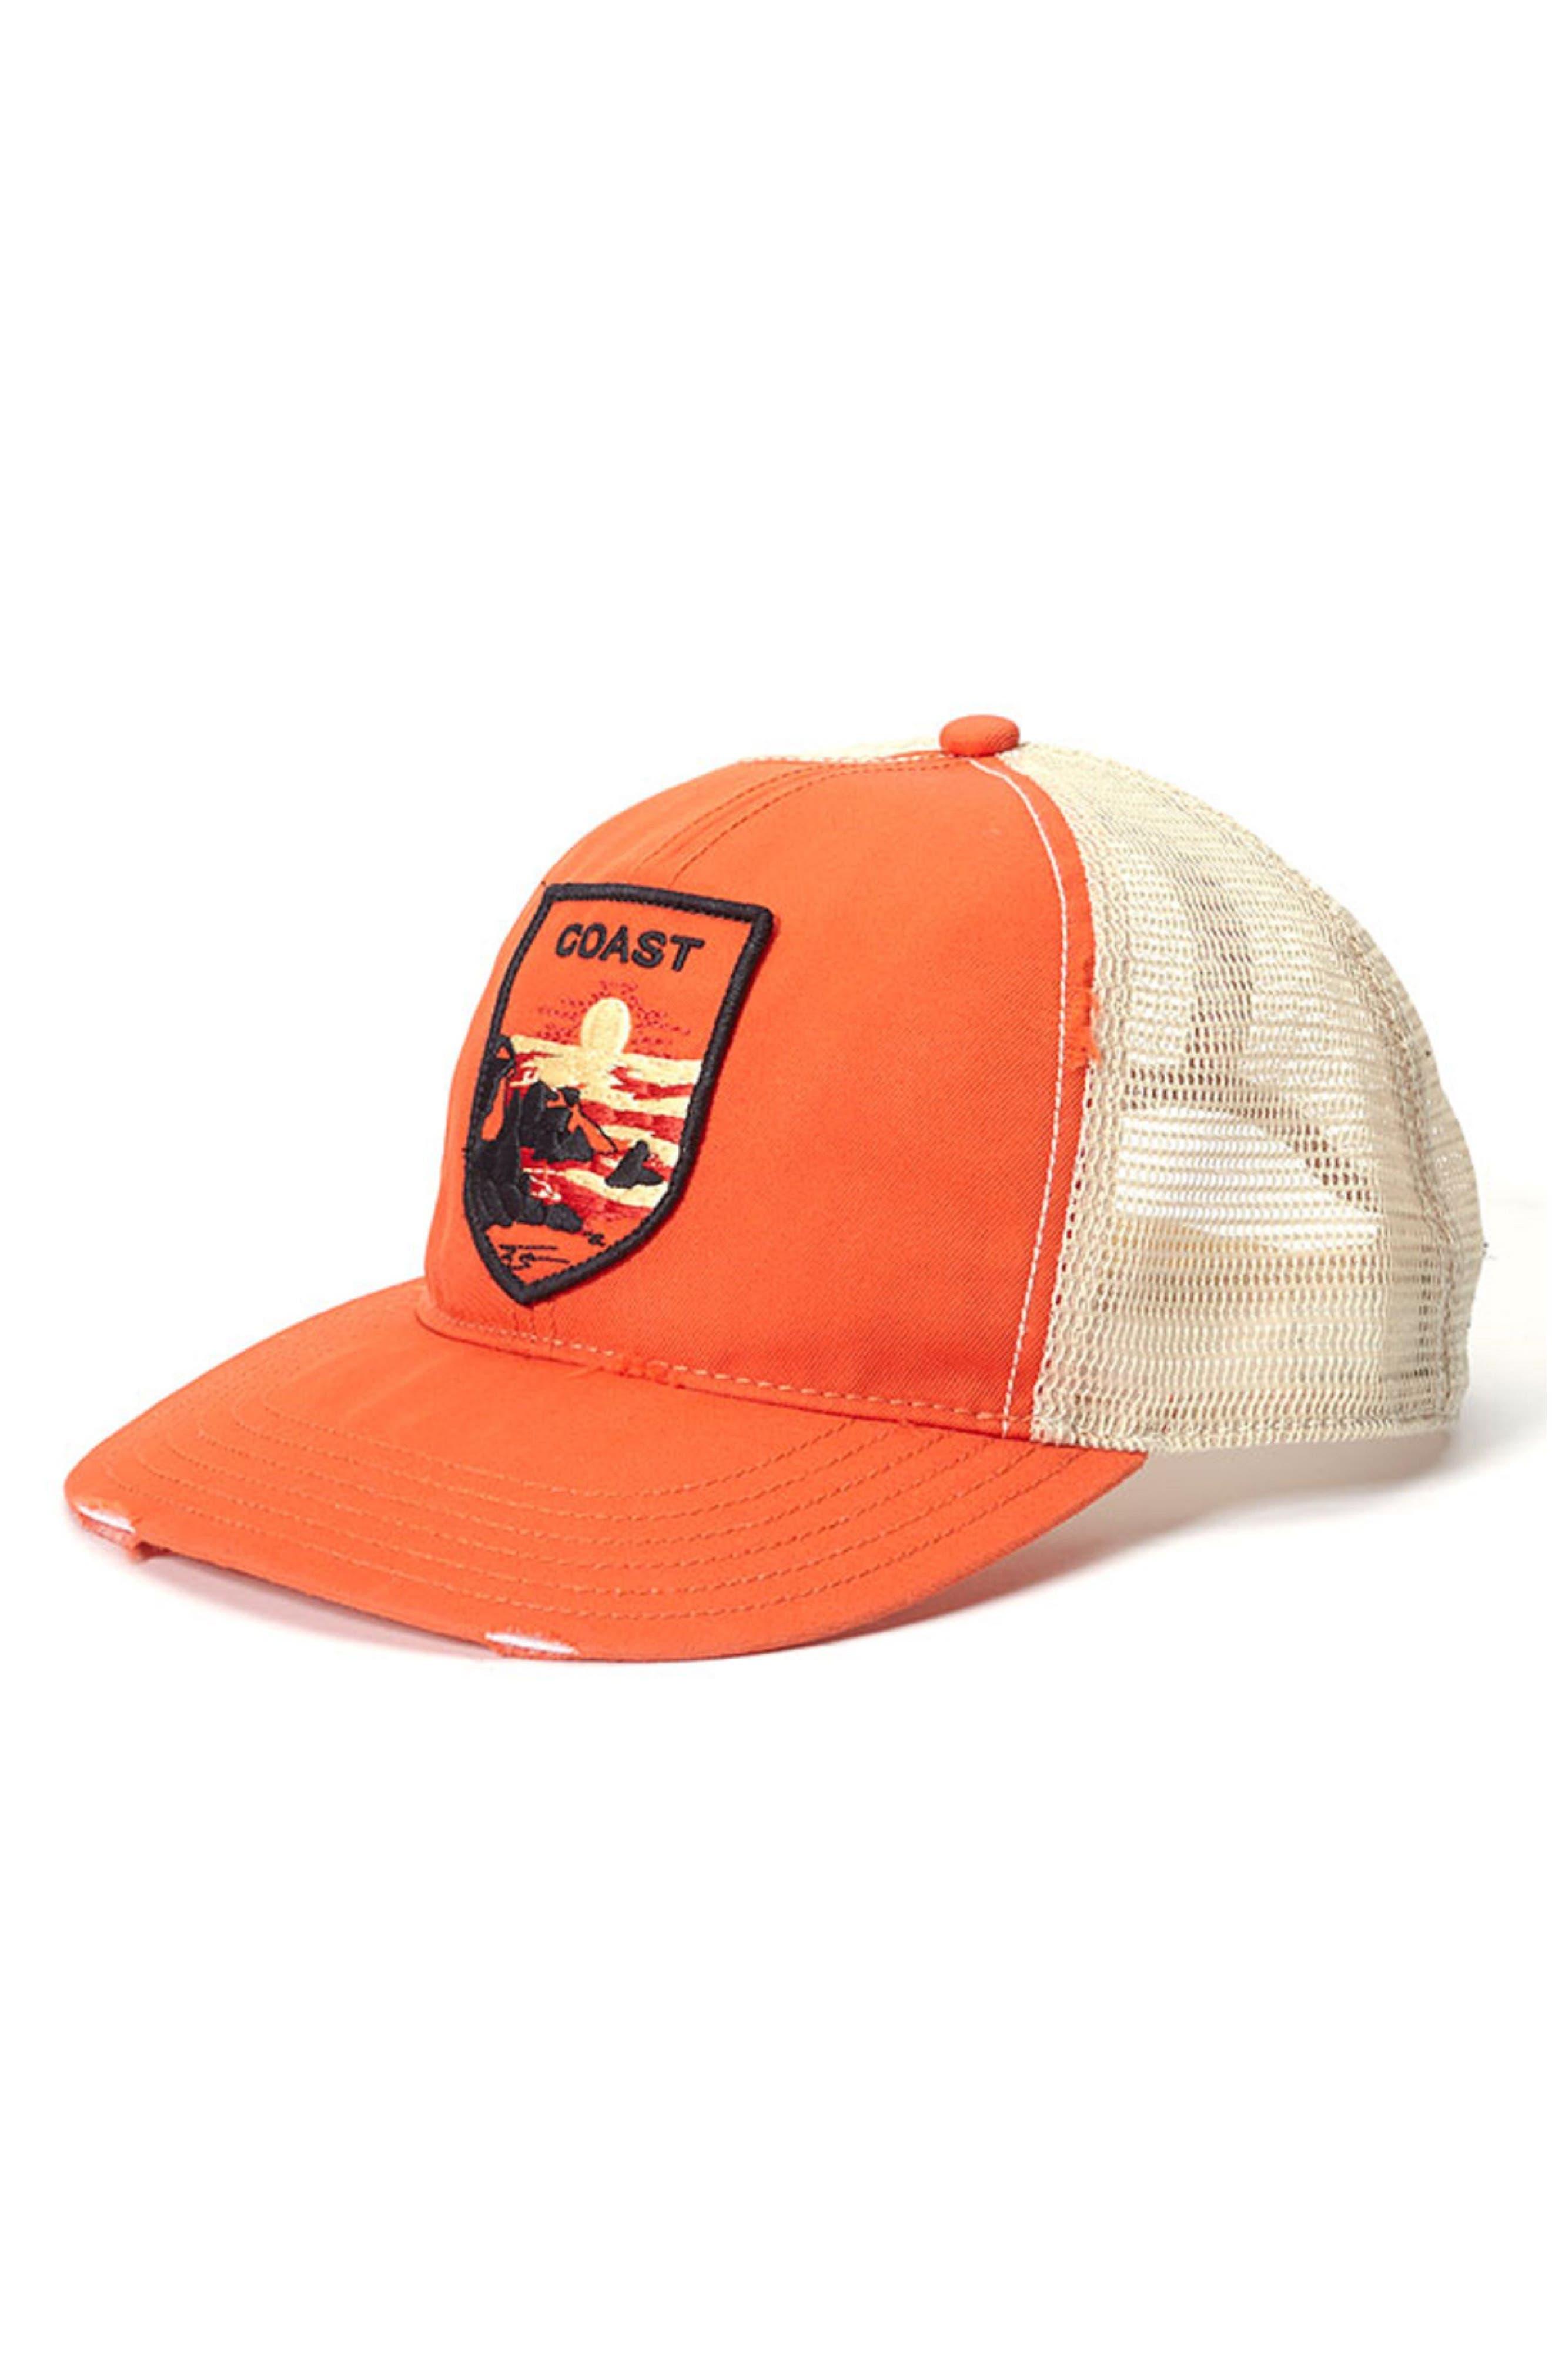 Coast Out Trucker Hat,                         Main,                         color, Orange